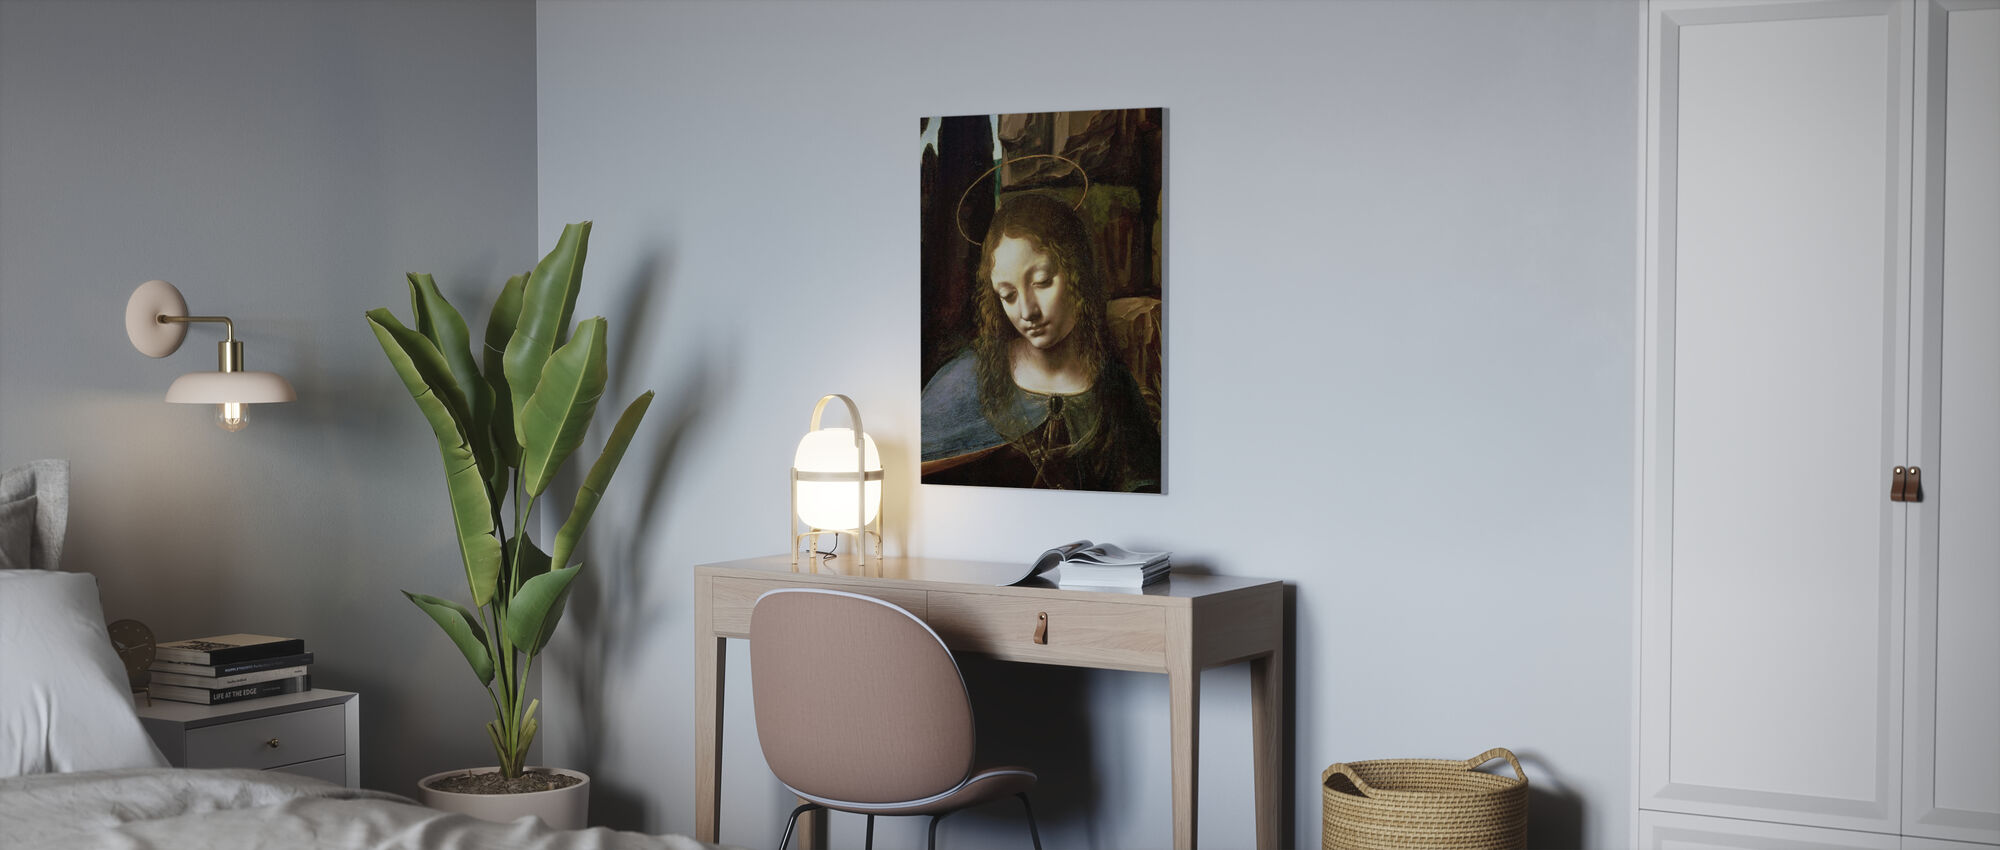 Virgin of the Rocks - Leonardo da Vinci - Canvas print - Office